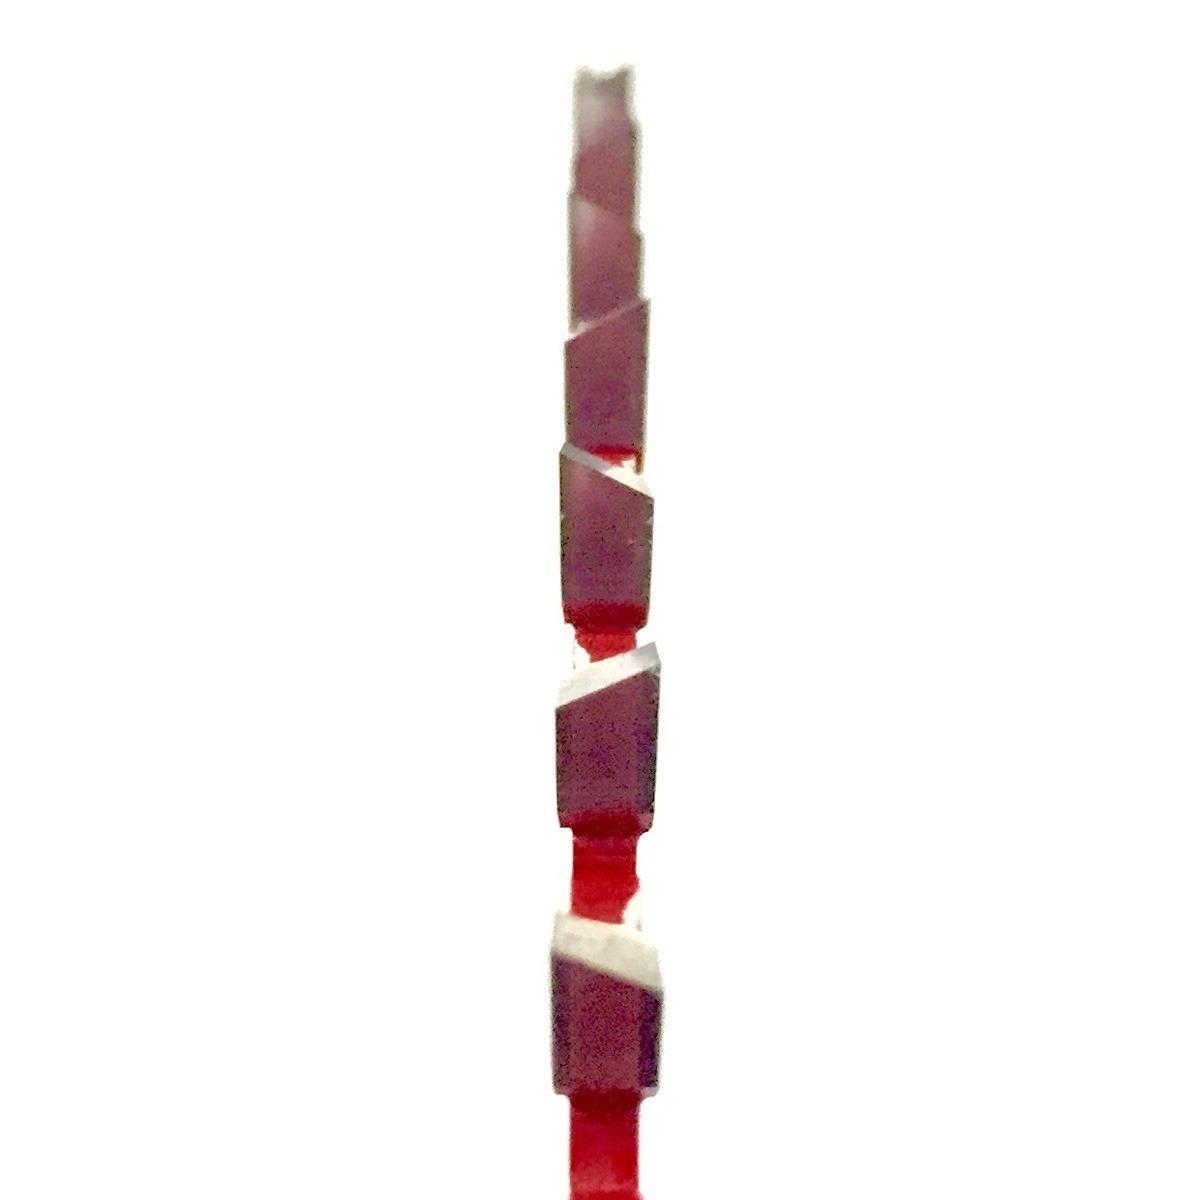 DISCO SERRA CIRCULAR 250x2,8x80z F30 ALT LP67M002 FREUD